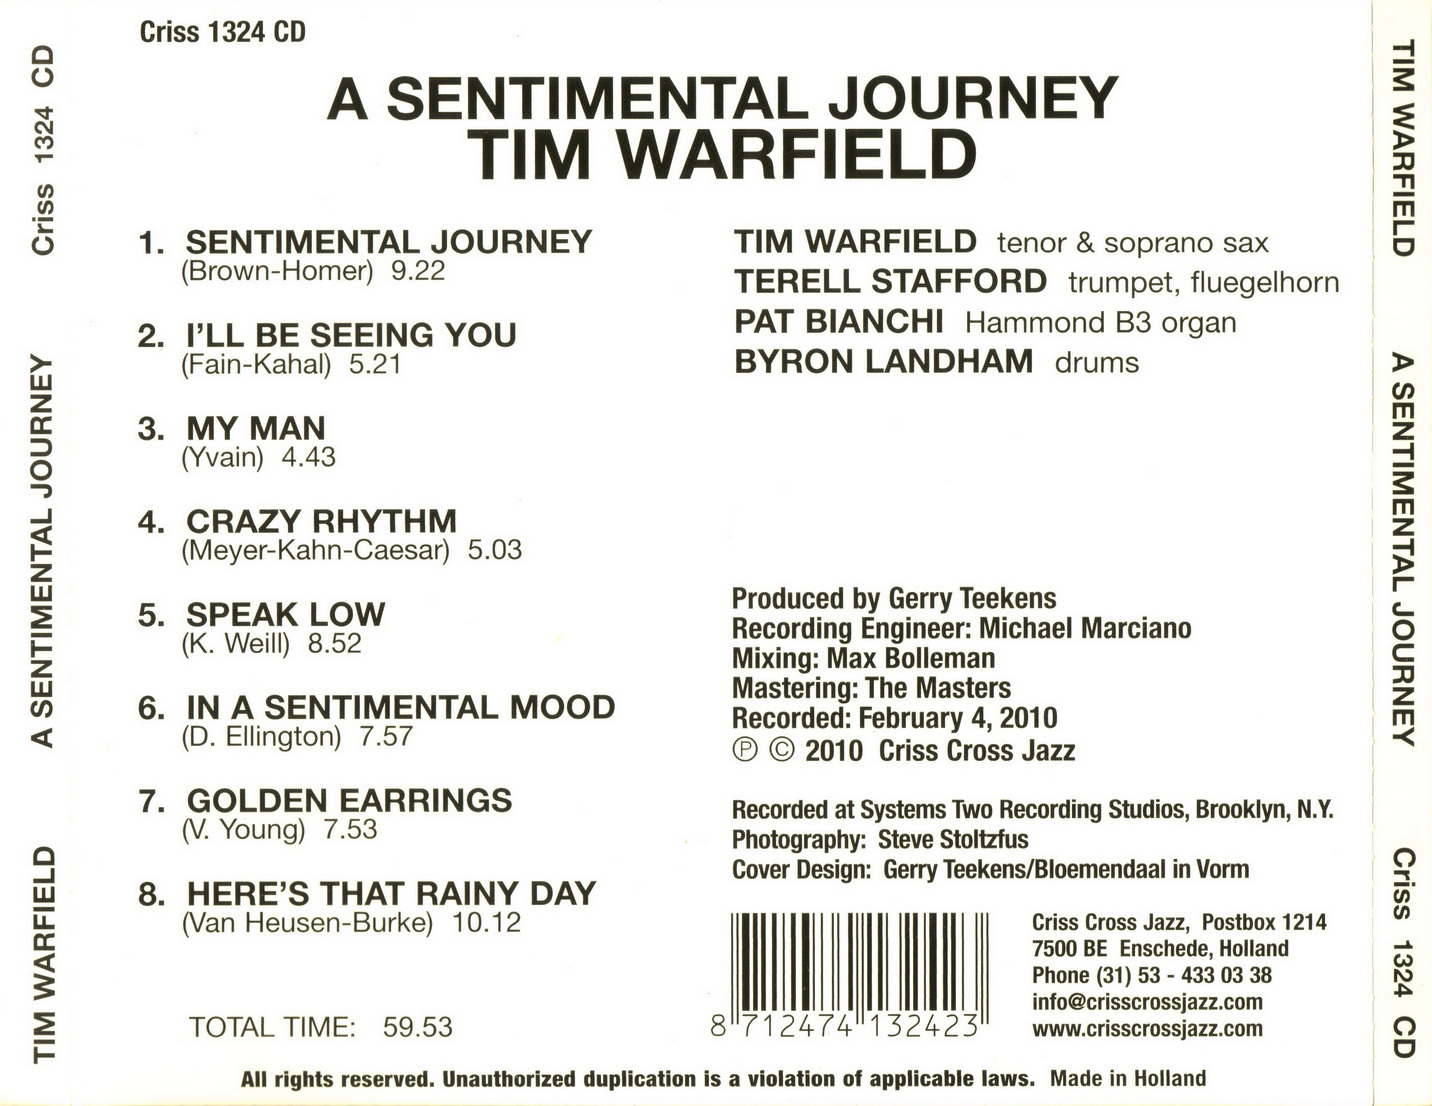 Tim Warfield - A Sentimental Journey (2010)